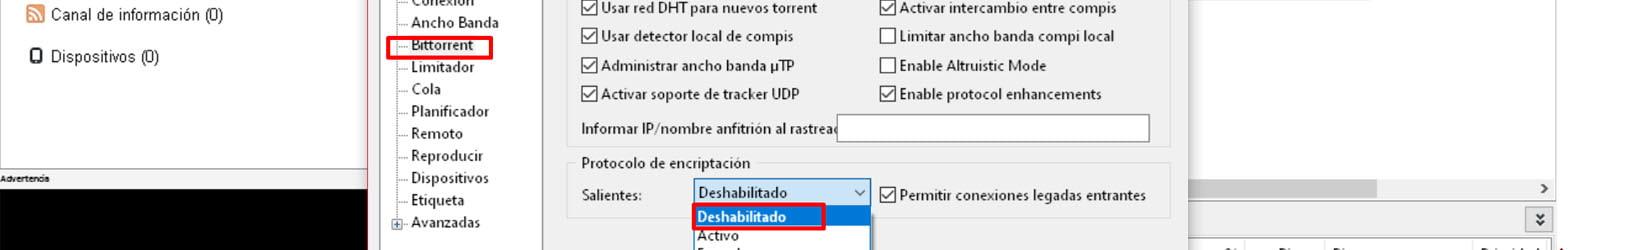 acelerar descargas utorrent